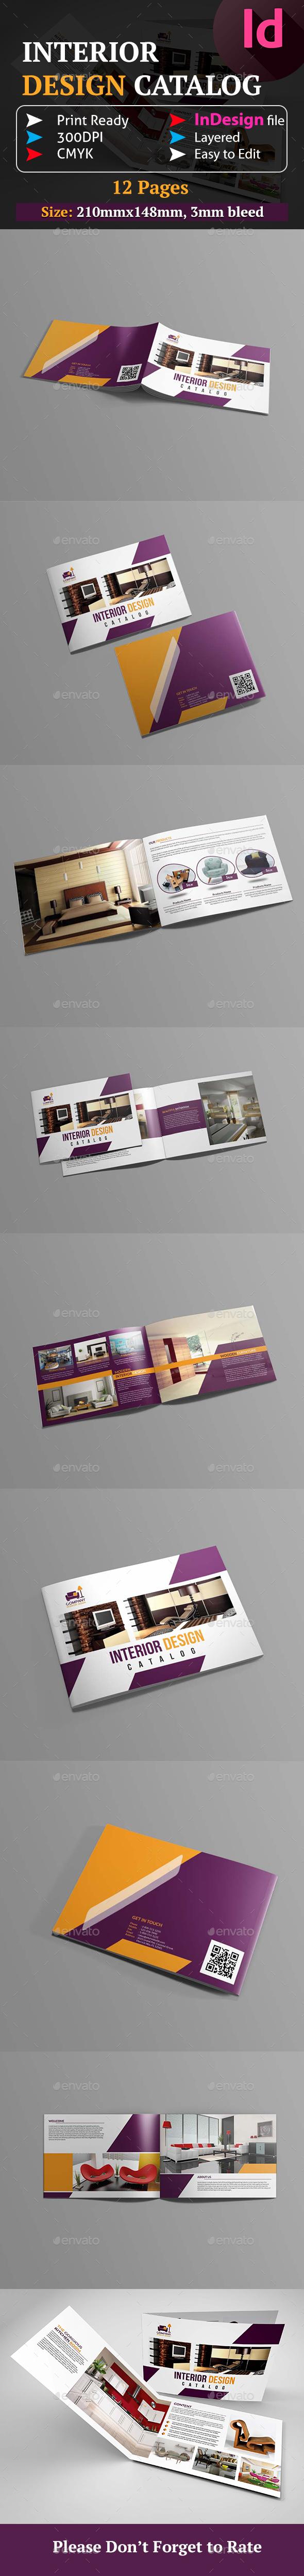 Interior Design Catalog. - Catalogs Brochures